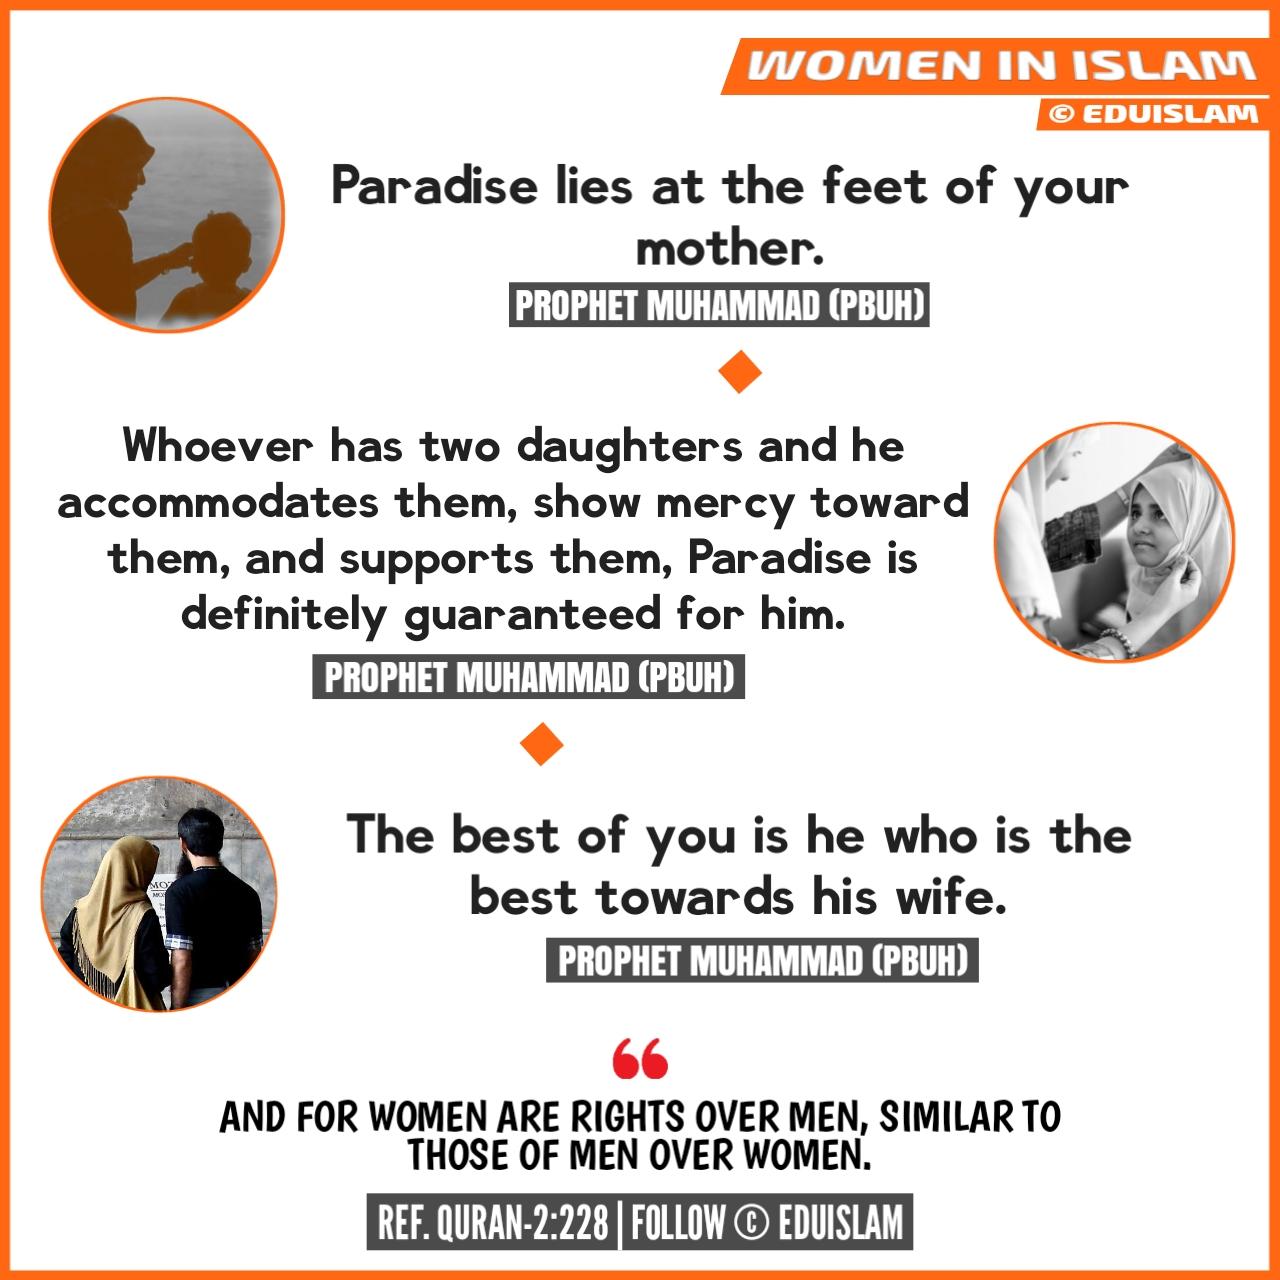 Status of women in Islam, International Women's day and Islam, Islamic quotes, mother in Islam, daughter in Islam, hadith about wife, hadith about mother, importance, role, Muslim women, EduIslam